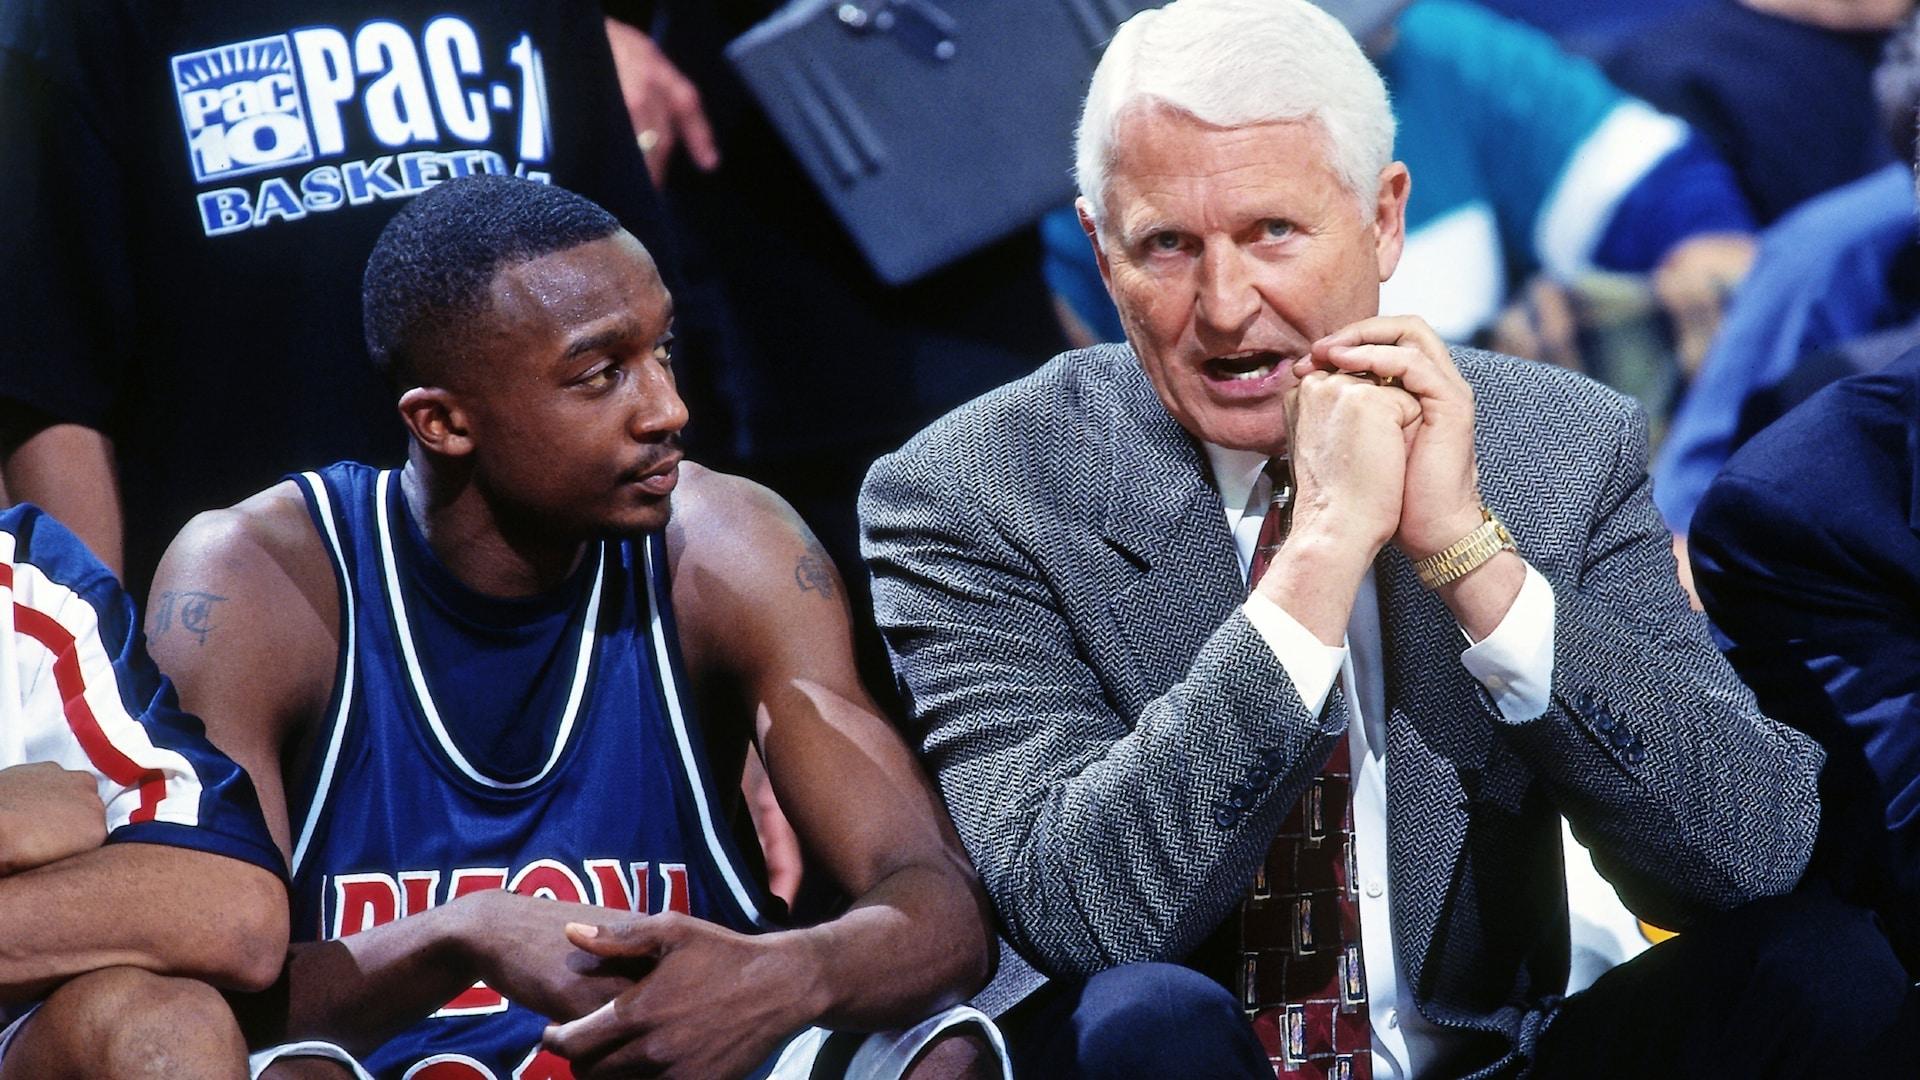 Lute Olson, Arizona coaching legend, dies at 85